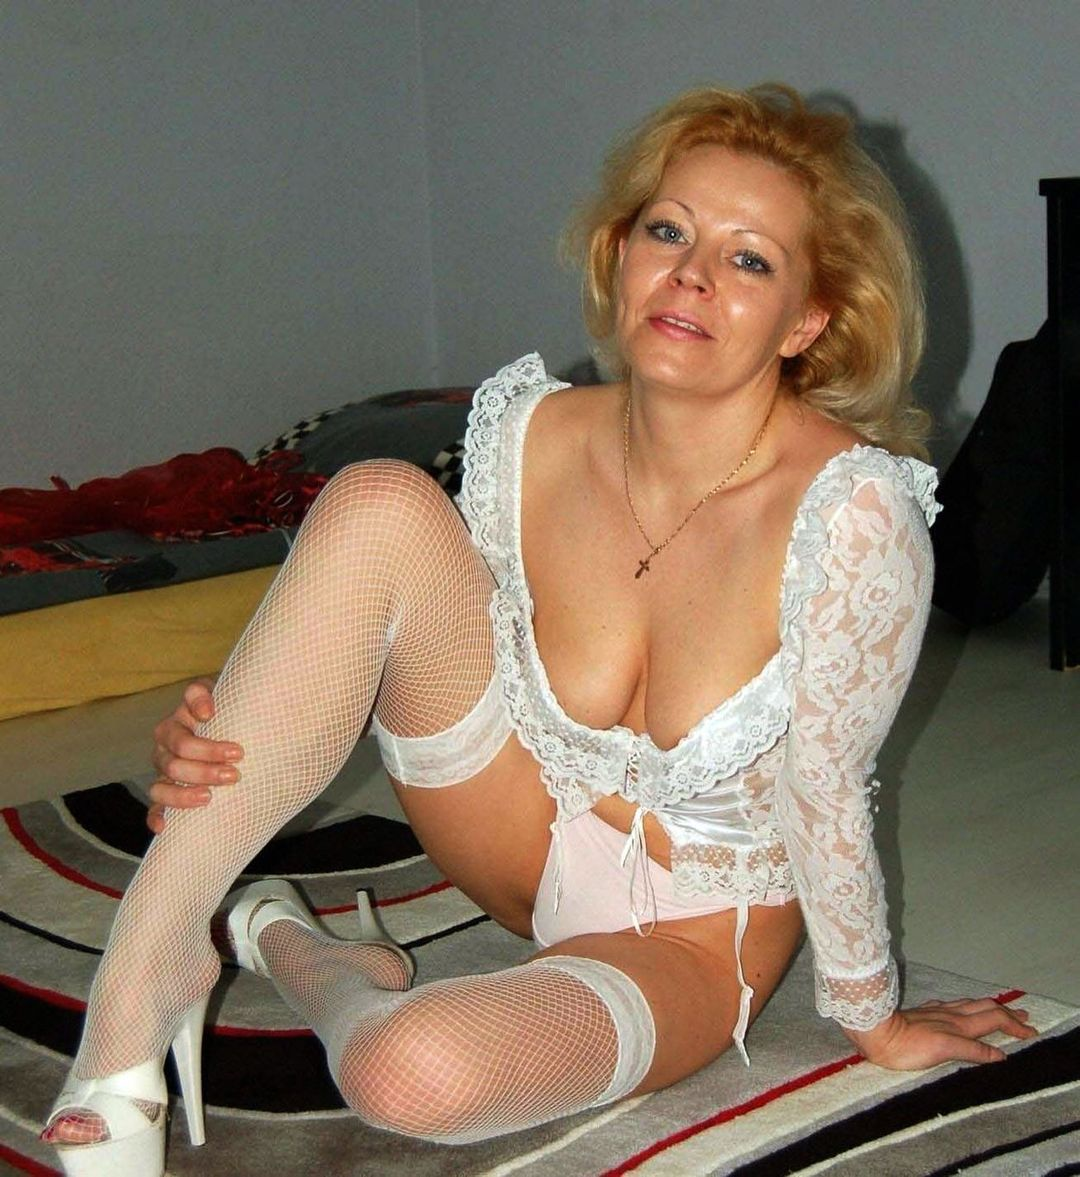 Nude photo cougar chaude du 93